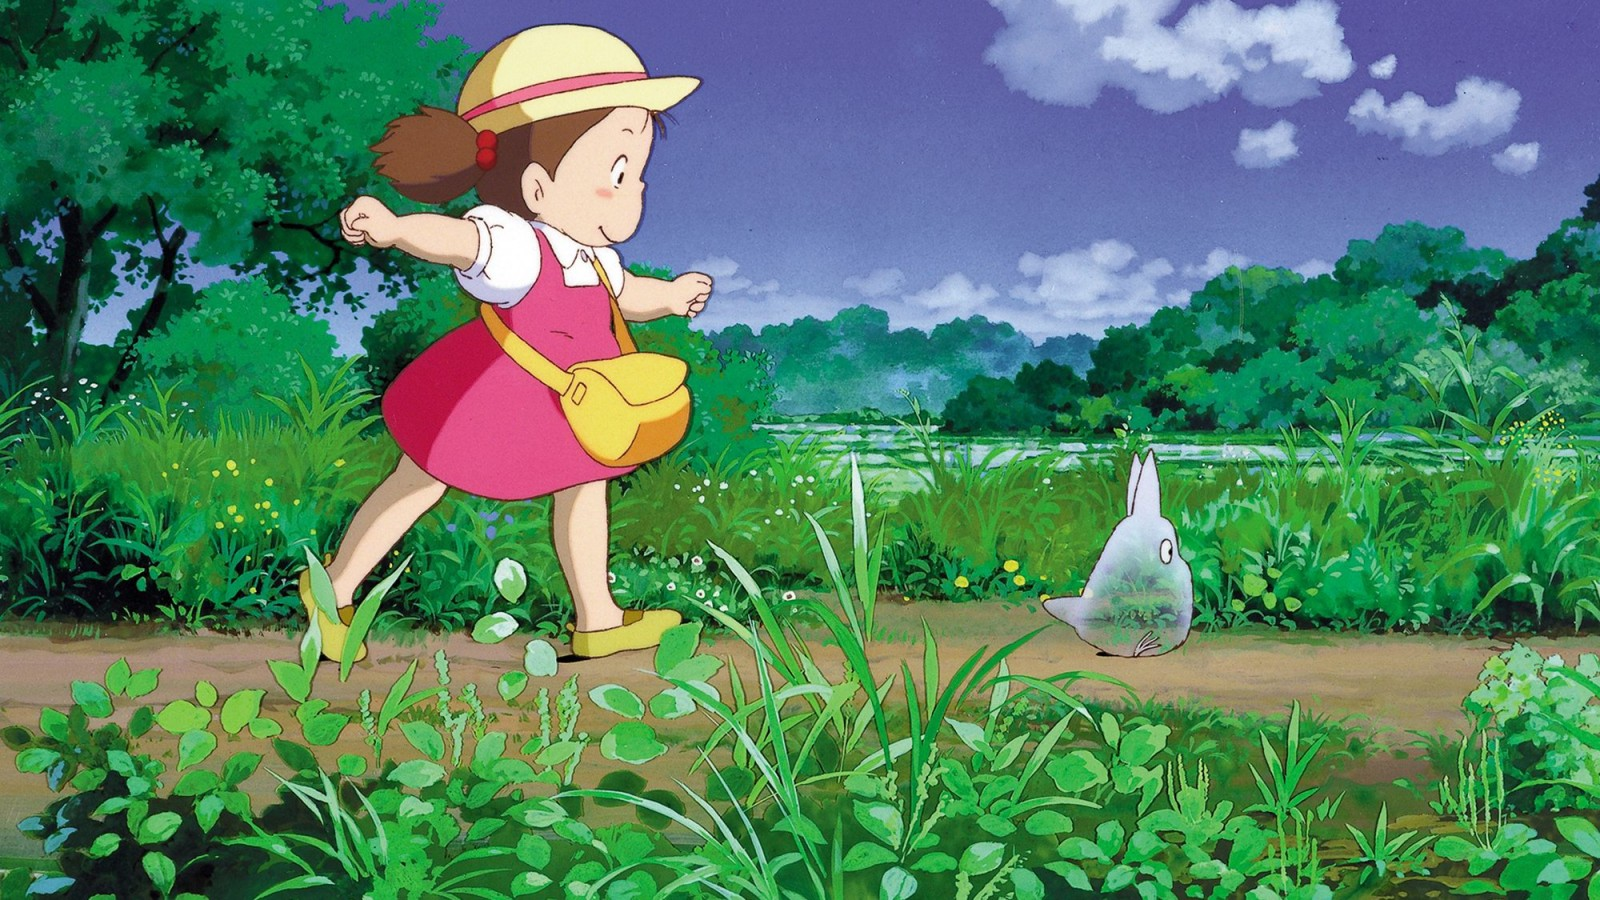 Anime My Neighbor Totoro  5  HD Wallpaper